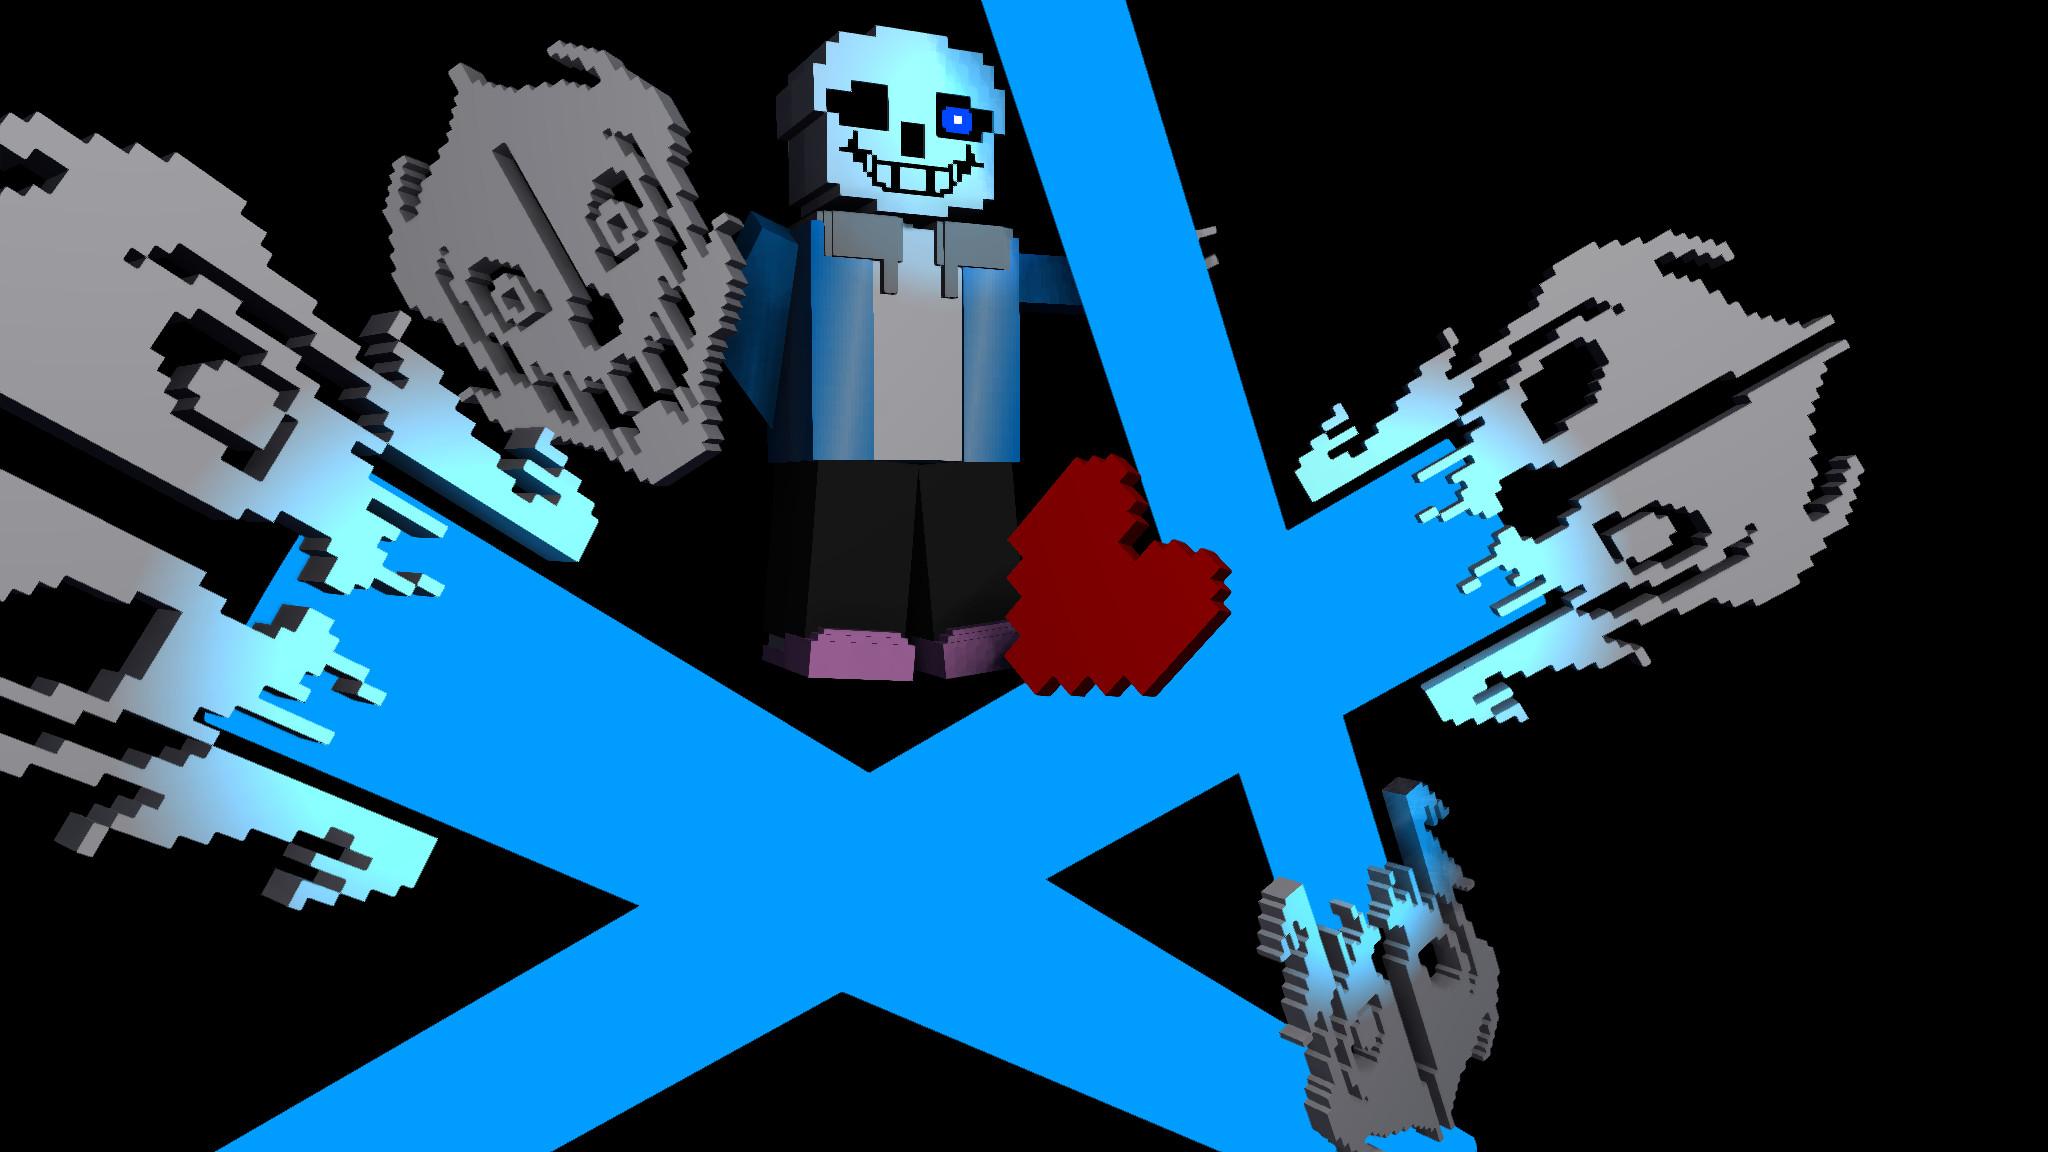 … 3D Undertale Wallpaper] – The True Hell by Creeper2545